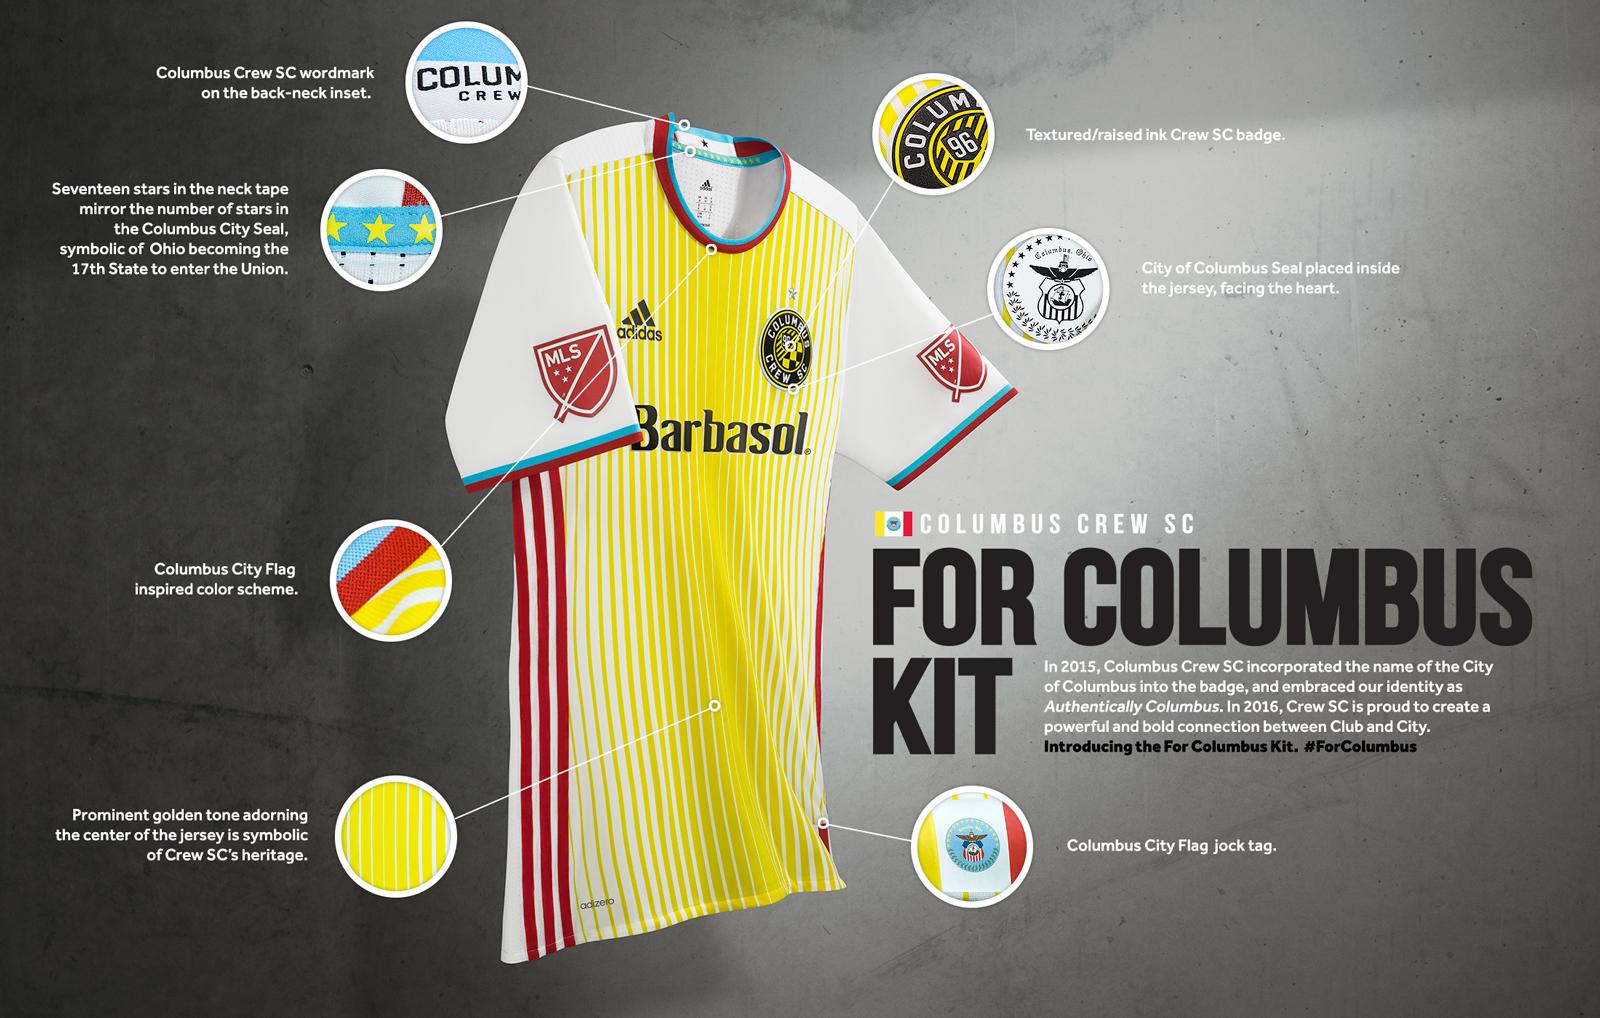 Columbus Crew SC For Columbus kit_87418